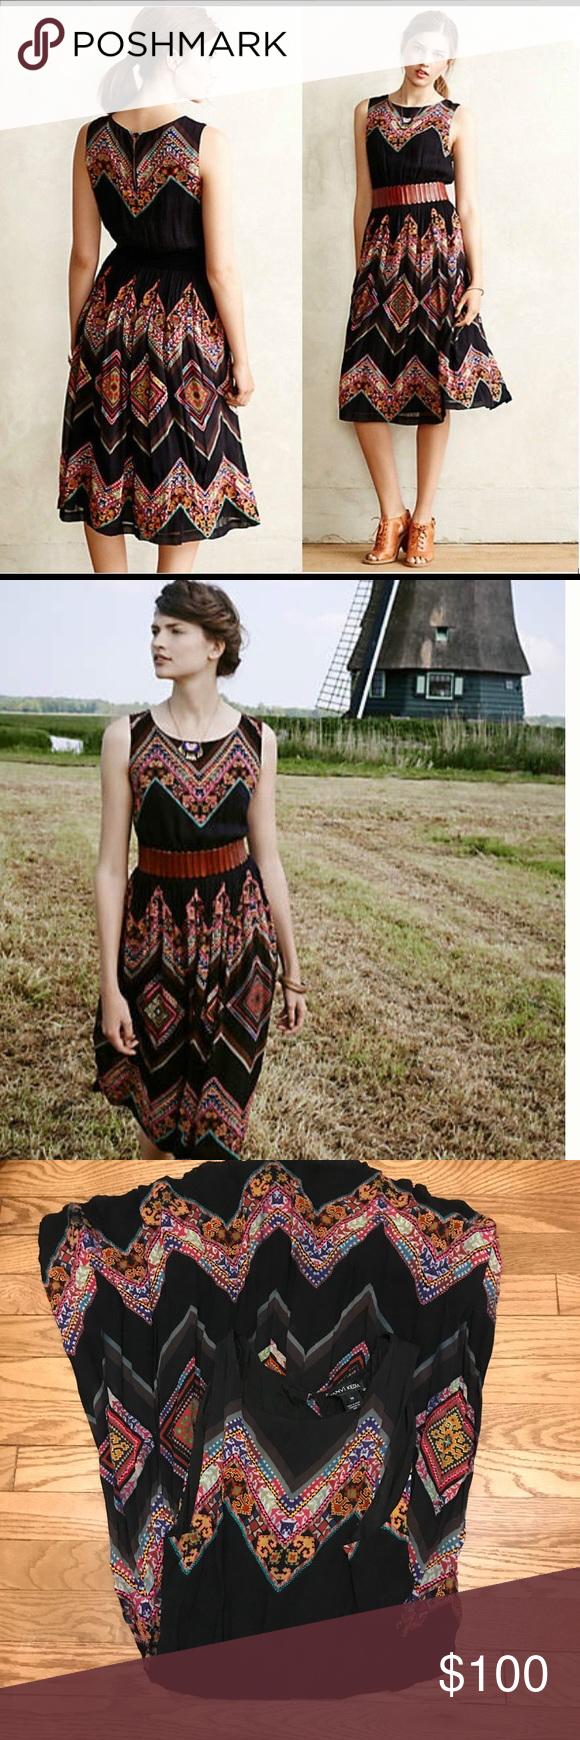 "c85854d5f3d3 Anthropologie Patchwork Chevron Midi Dress, sz 10 By Tanvi Kedia. In VGUC  Approximate: Bust—19"" Waist—12-21"" (elastic) Length—42"" Anthropologie  Dresses"